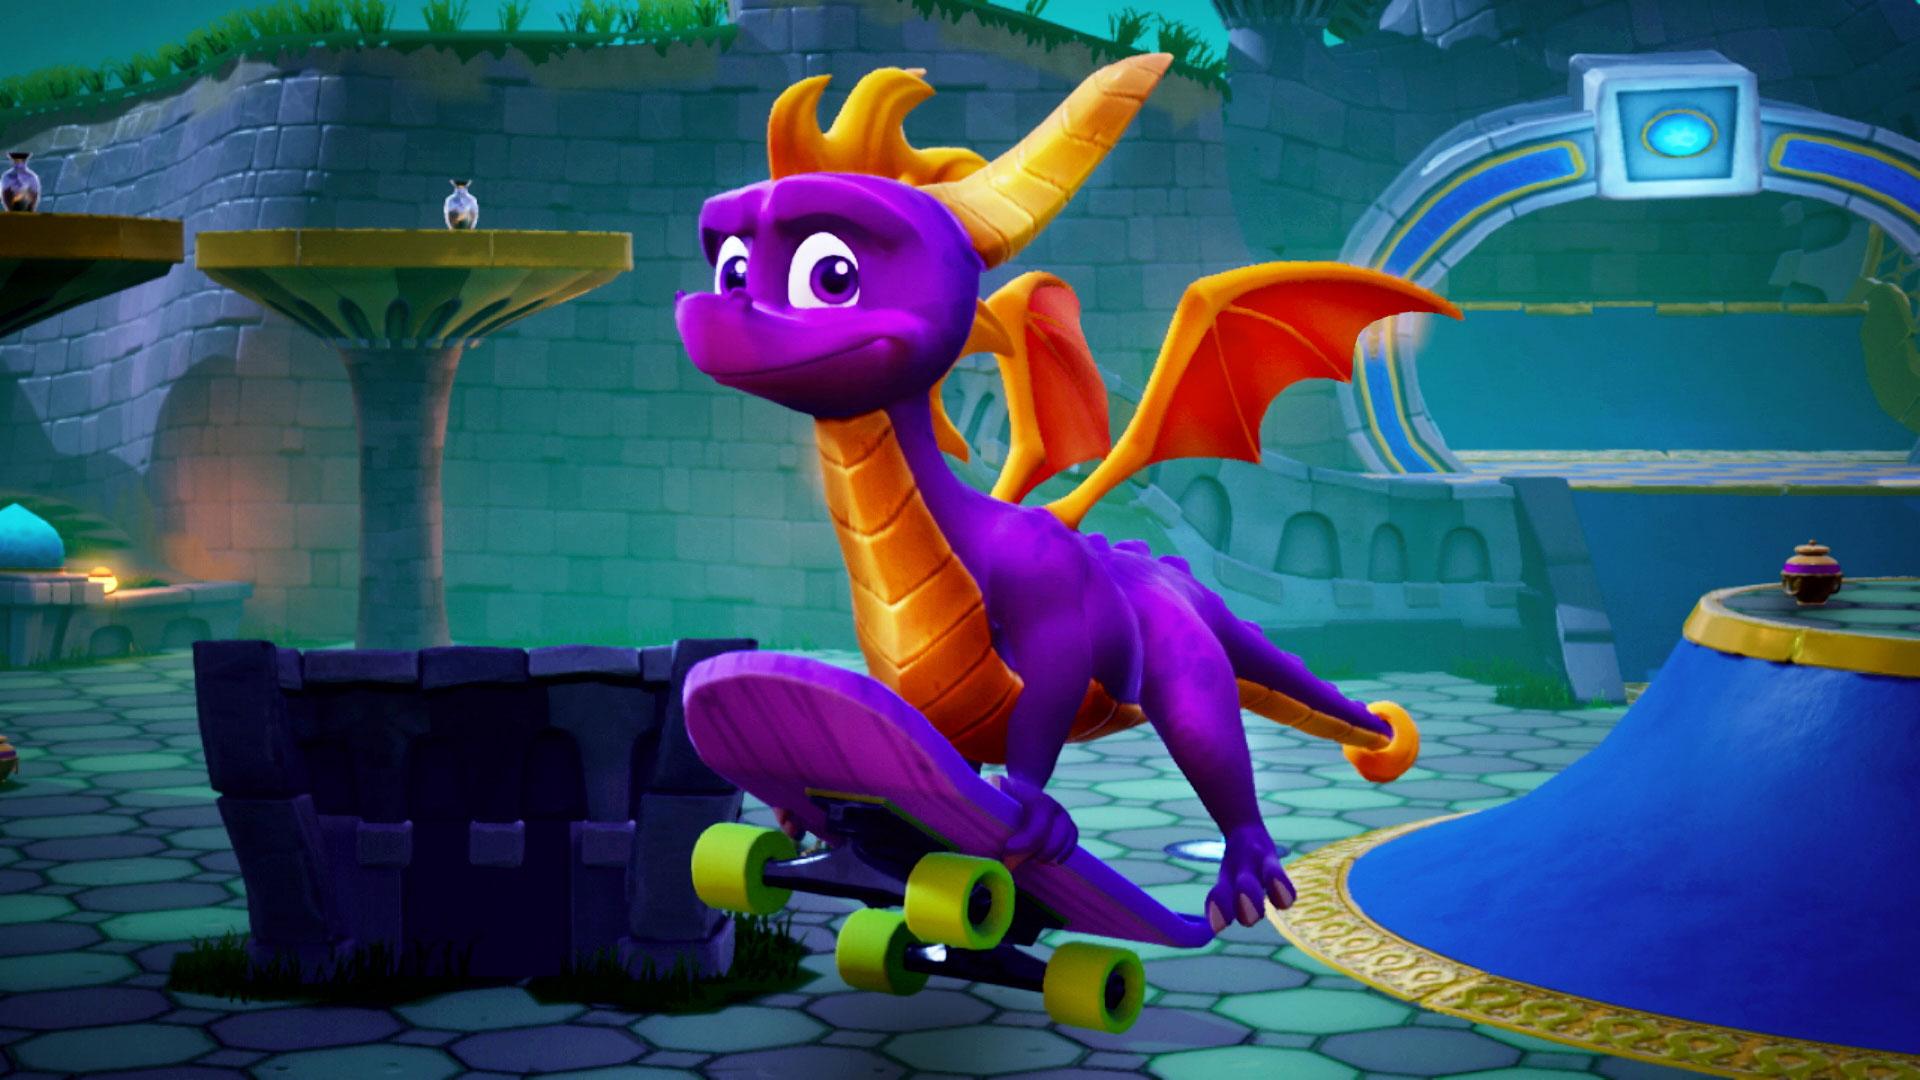 Spyro-Reignited-Trilogy_Switch_Enchanted-Towers-Skatepark_FINAL (1).jpg